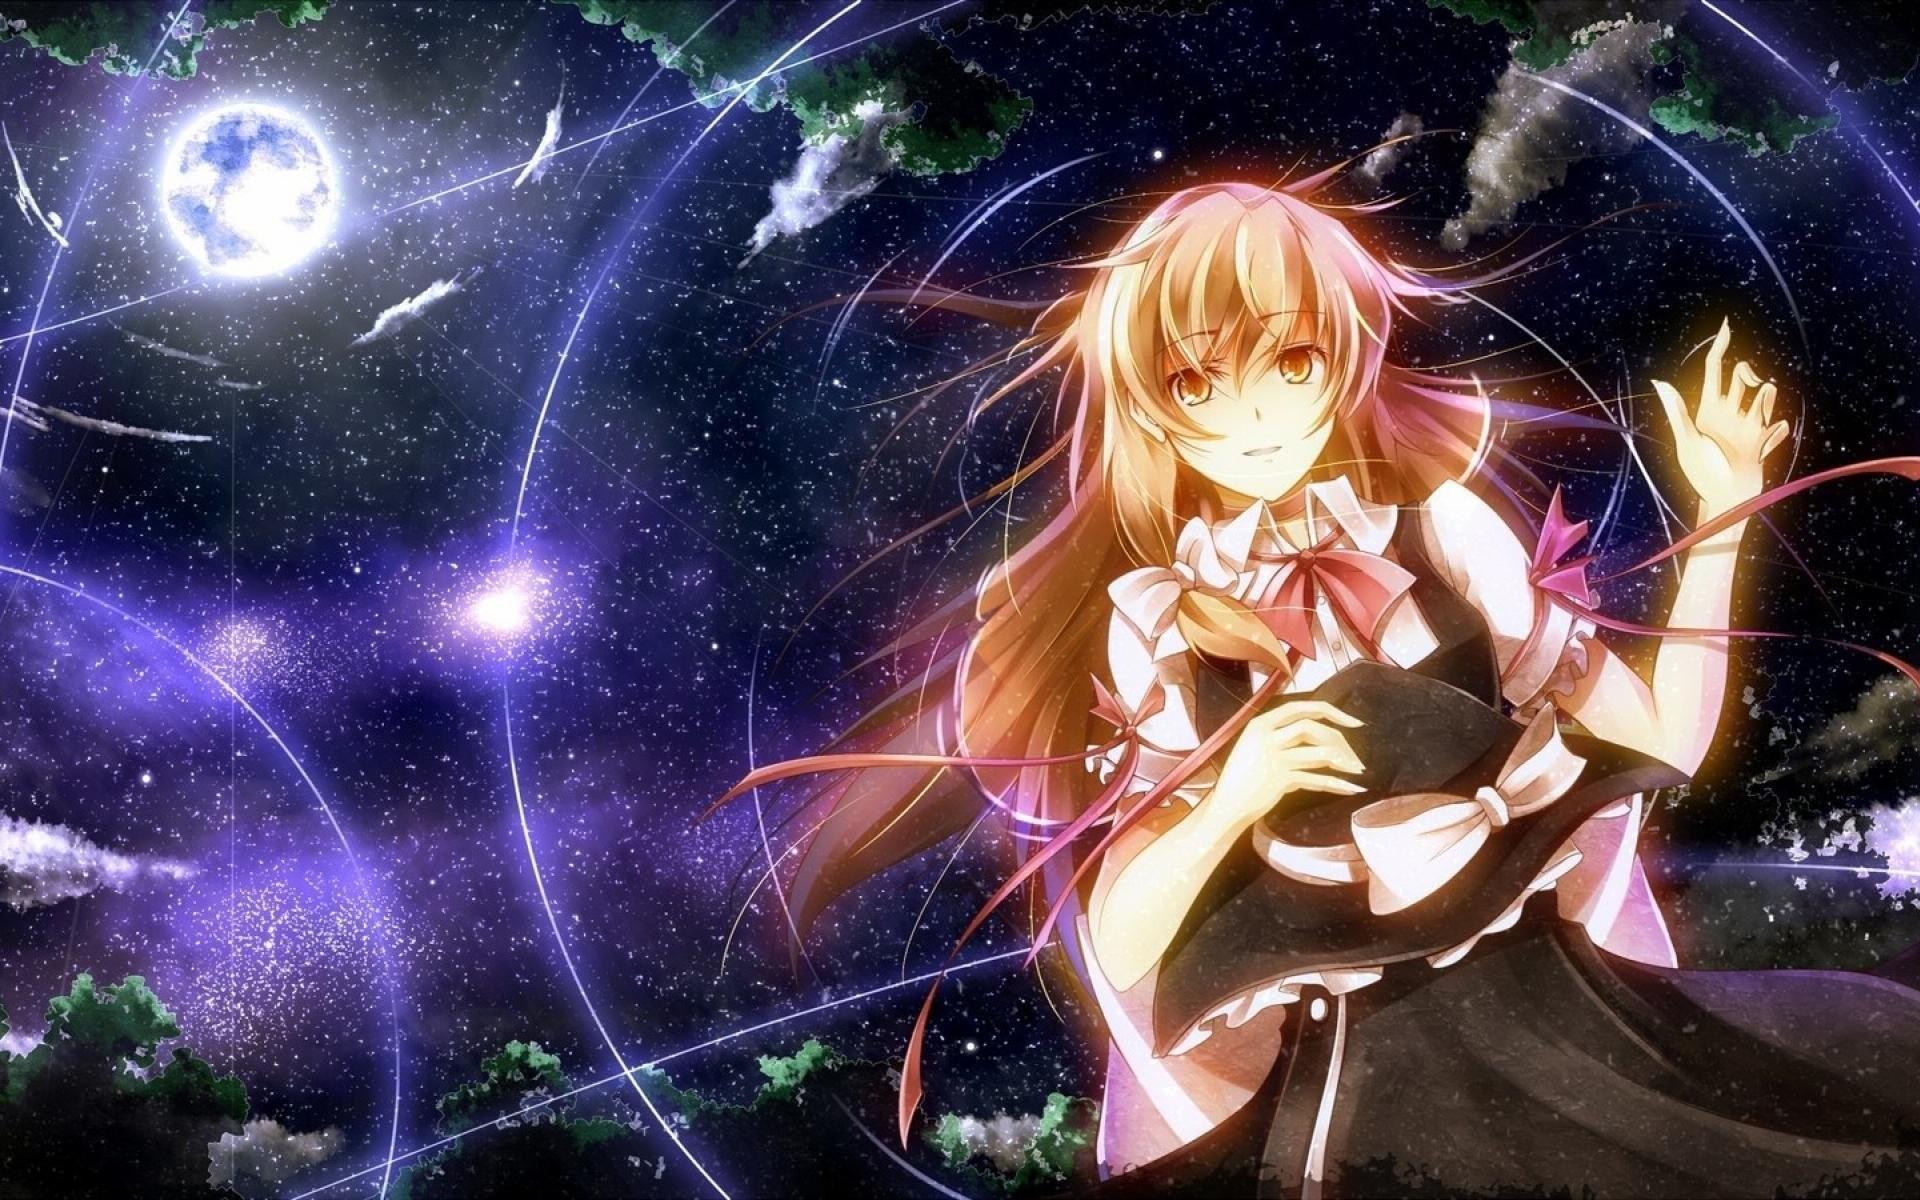 Anime – Touhou Girl Anime Marisa Kirisame Wallpaper